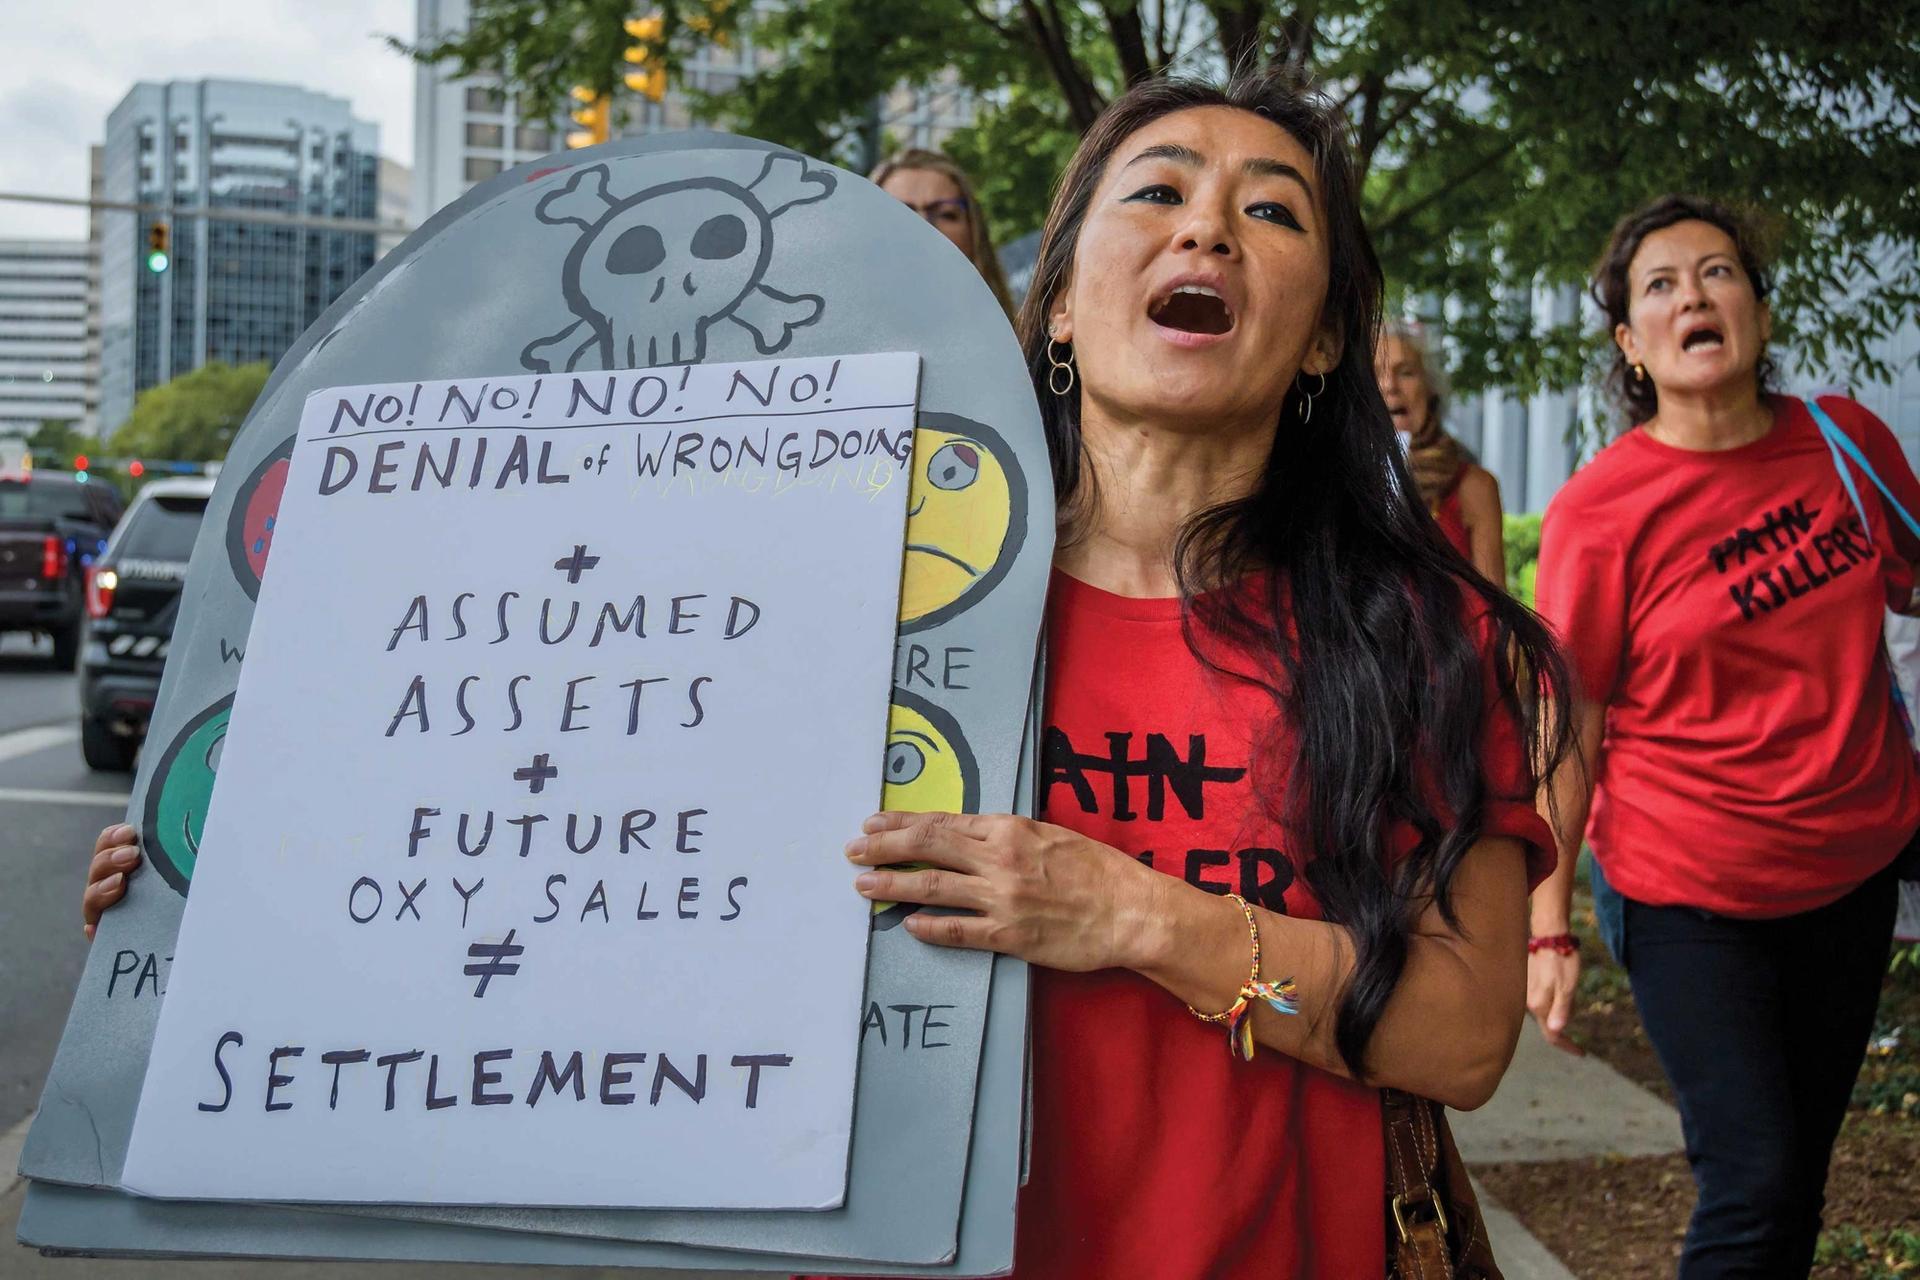 Protesters demonstrate outside of Purdue Pharma's headquarters Photo: Erik McGregor/LightRocket via Getty Images